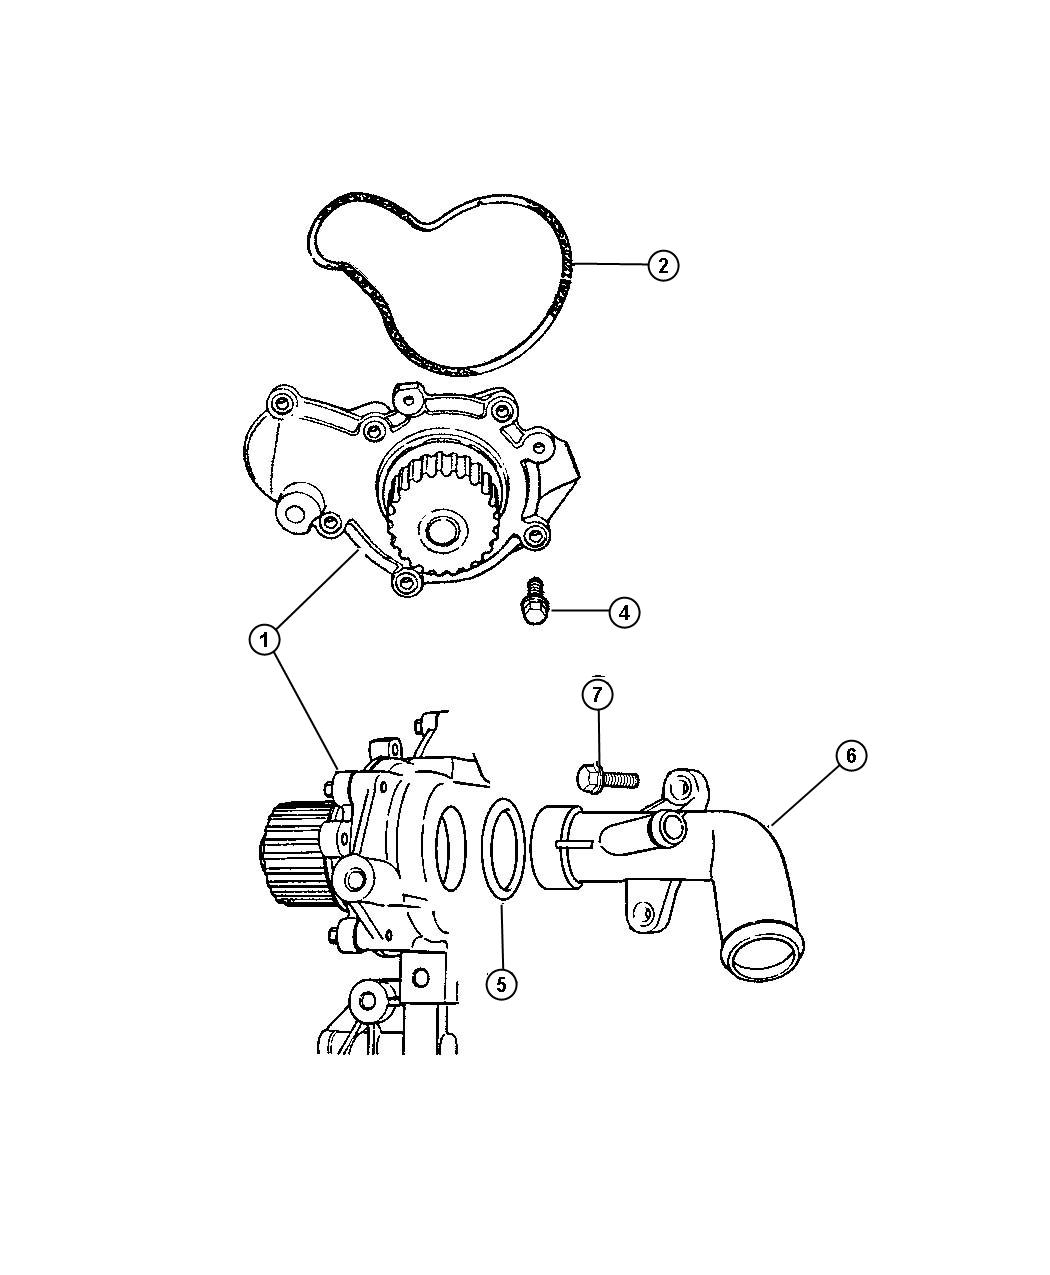 File Dodge Neon Stereo Wiring Diagram